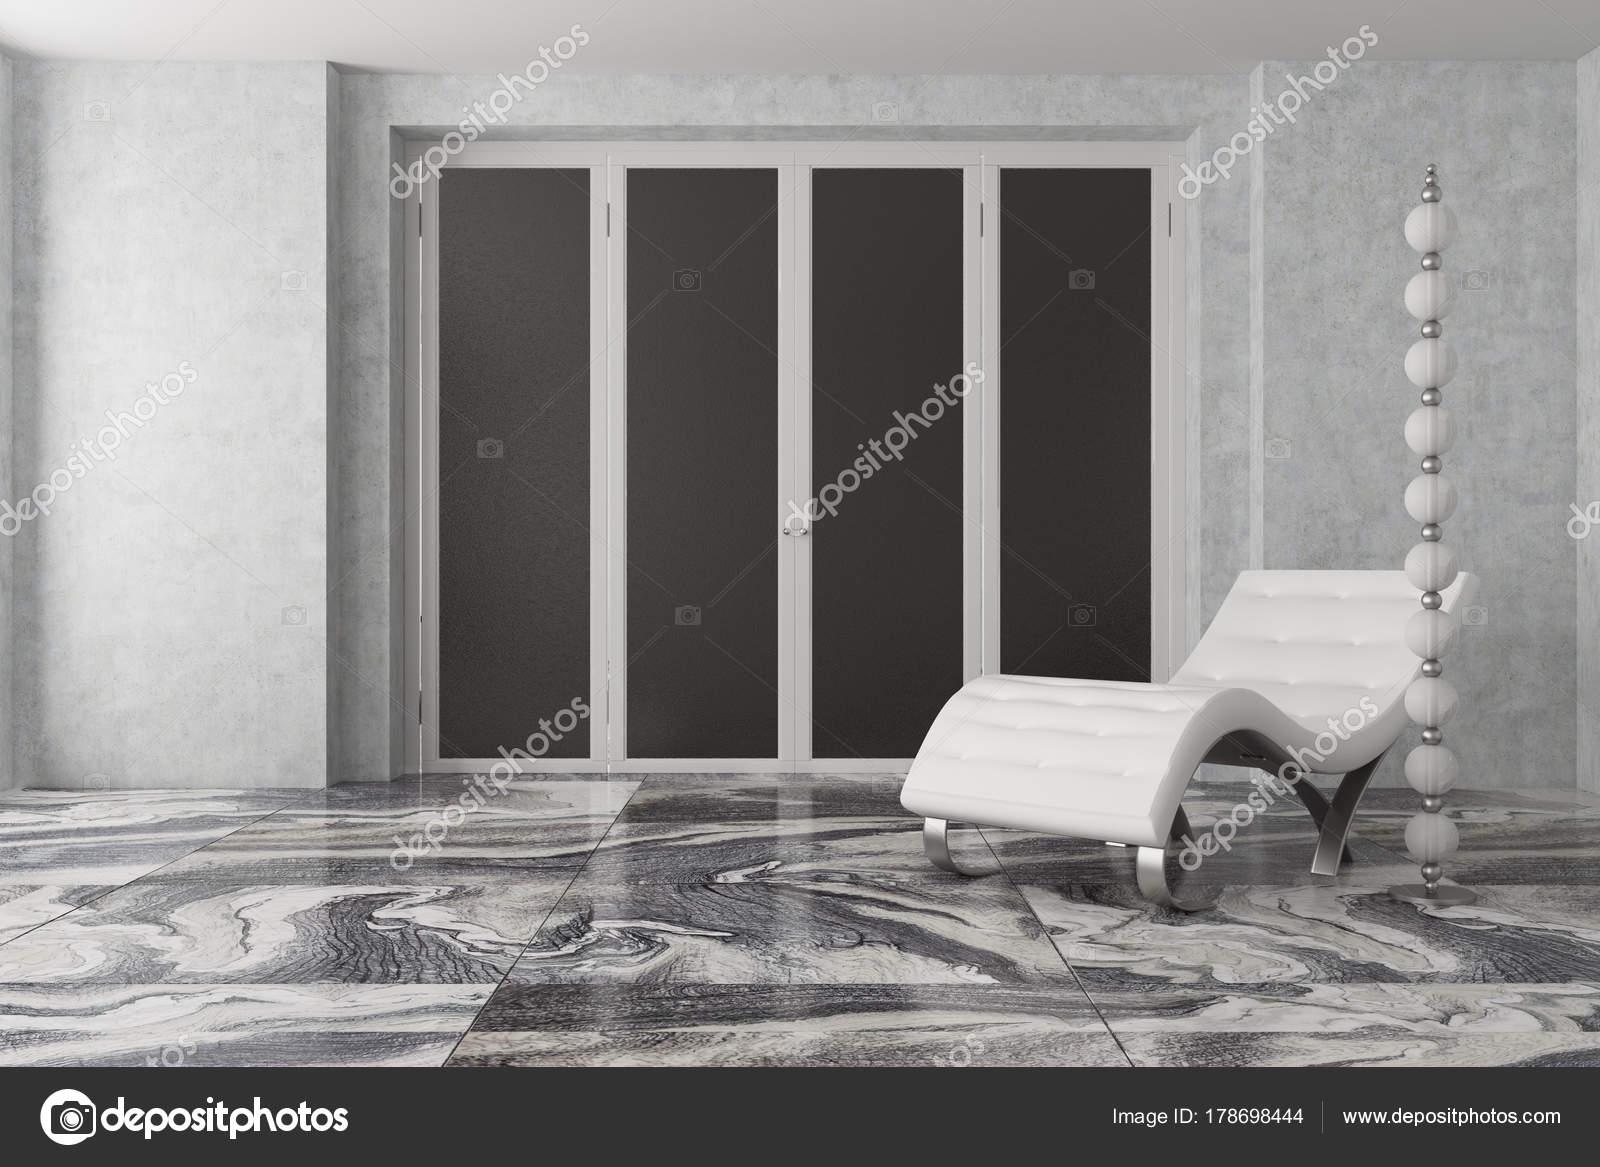 https://st3.depositphotos.com/2673929/17869/i/1600/depositphotos_178698444-stockafbeelding-luxe-grijs-woonkamer-leunstoel.jpg